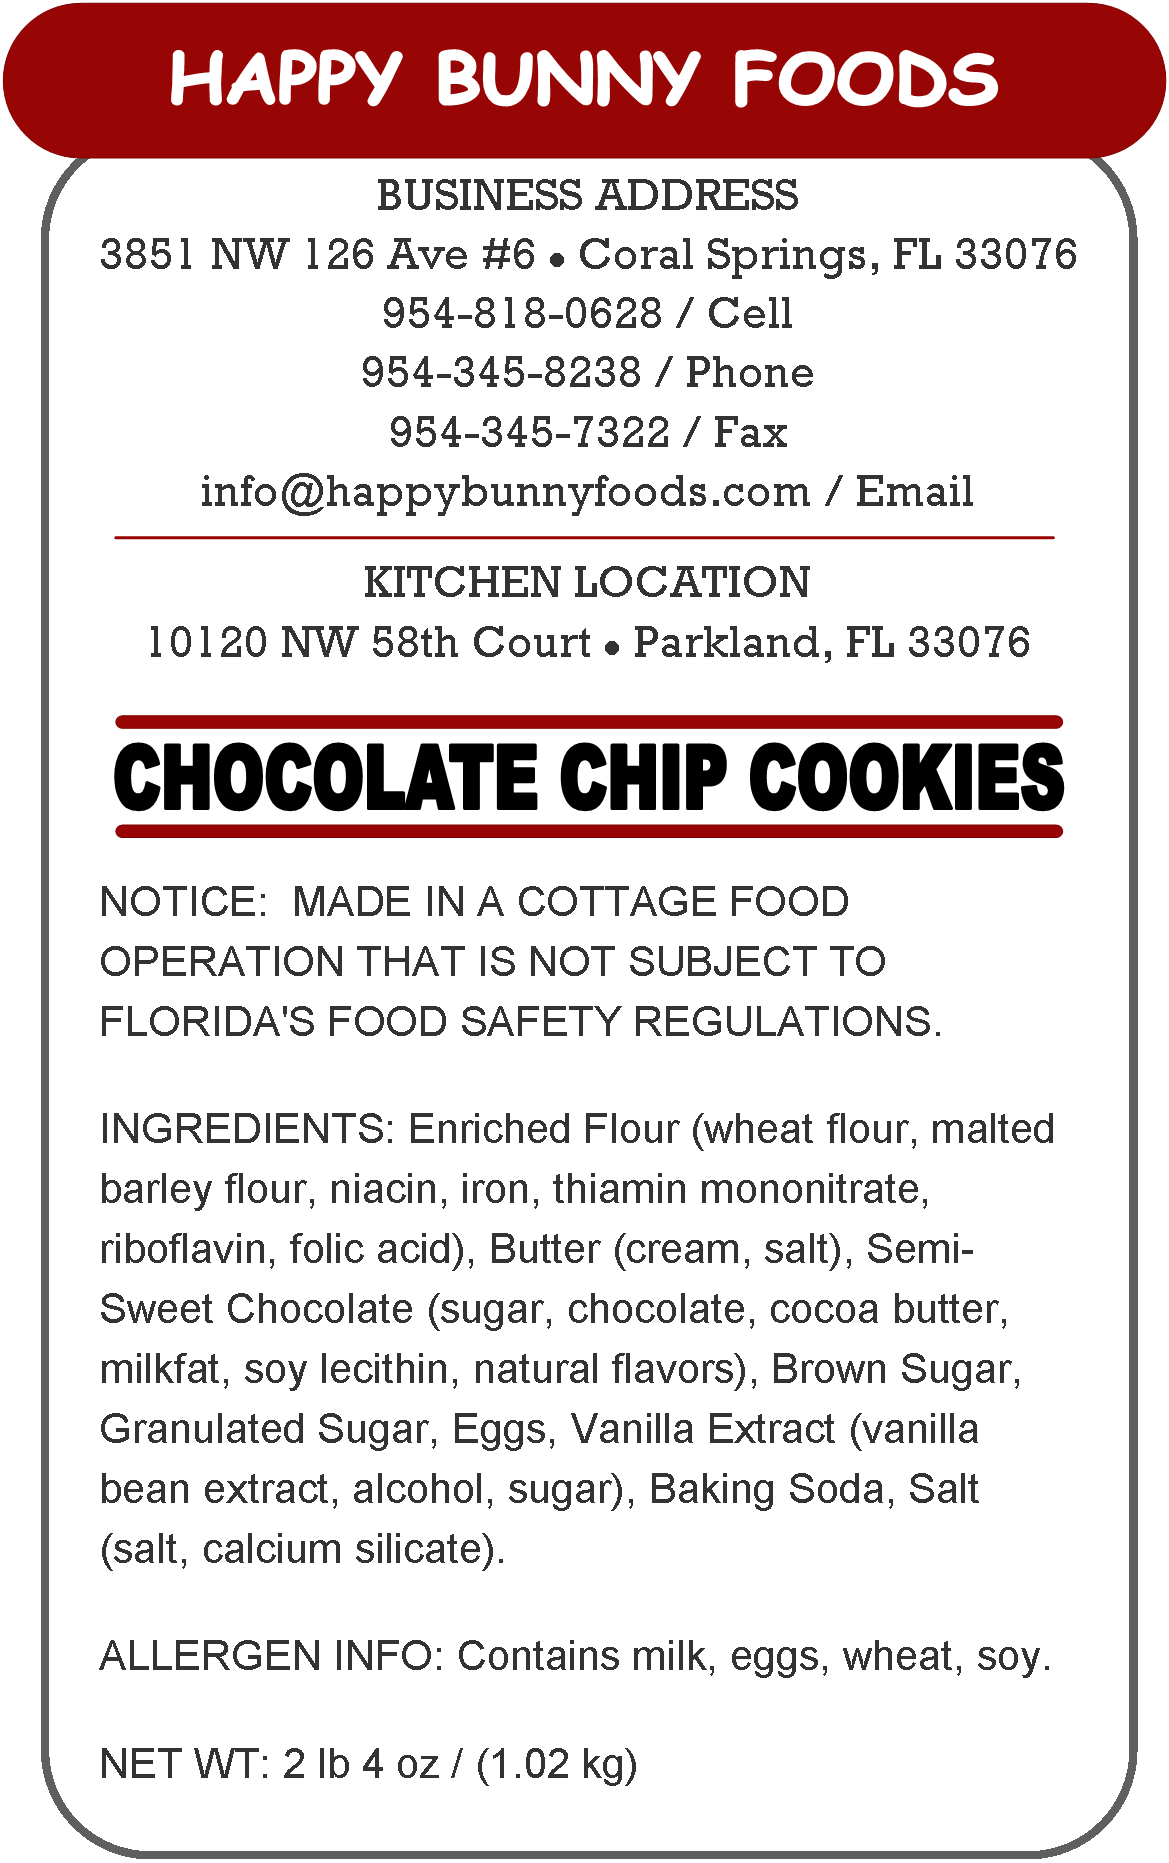 Florida Health Foods